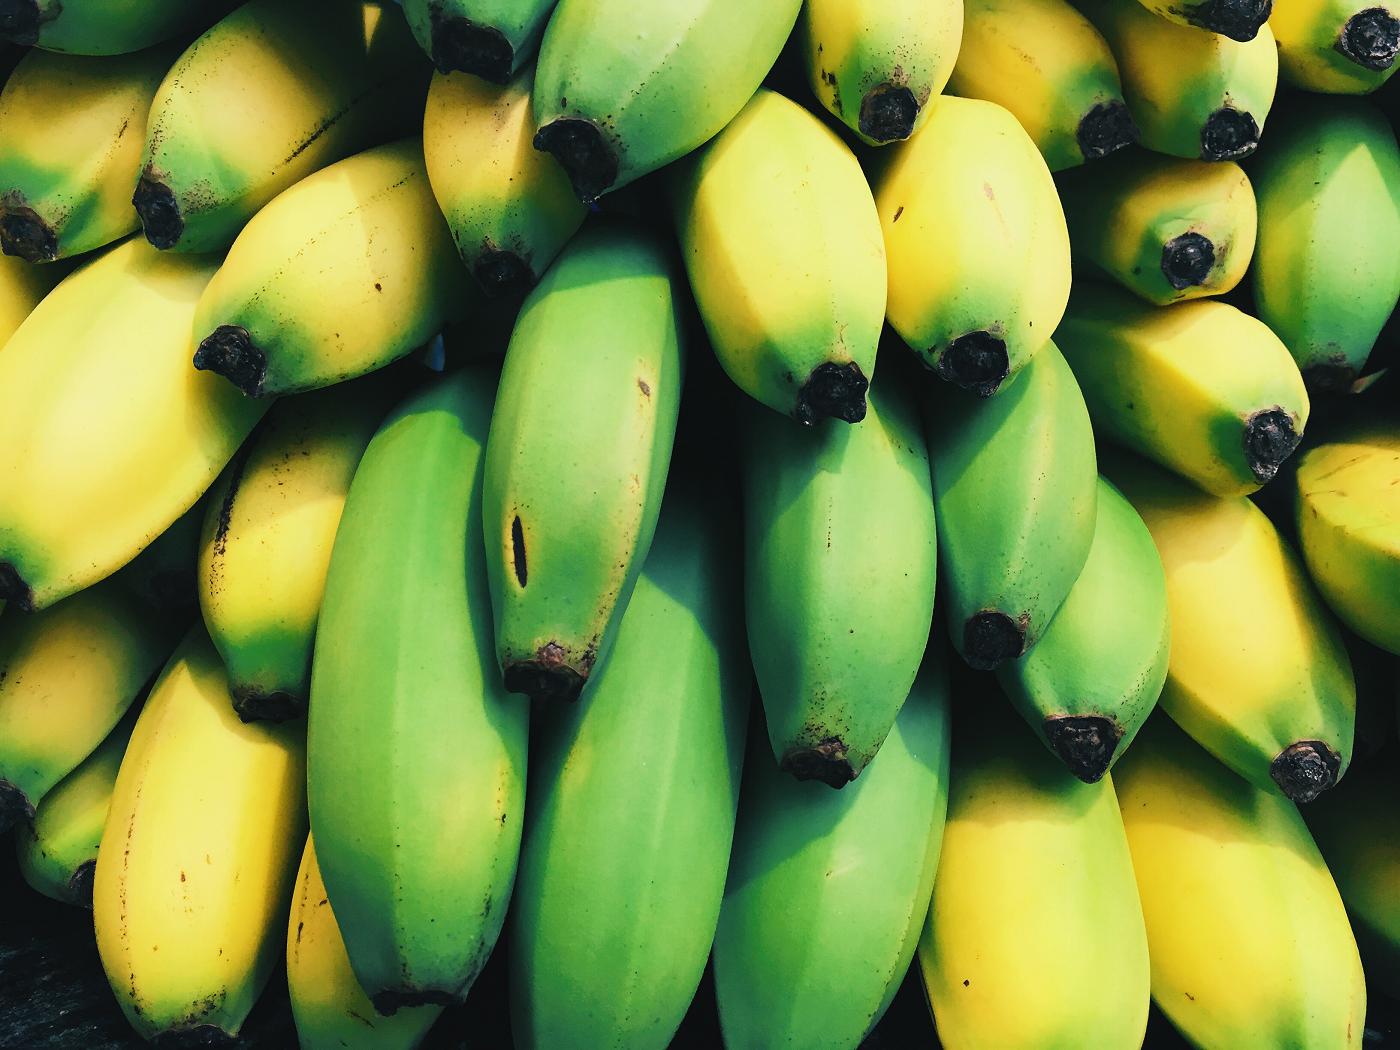 bunch-of-bananas.png